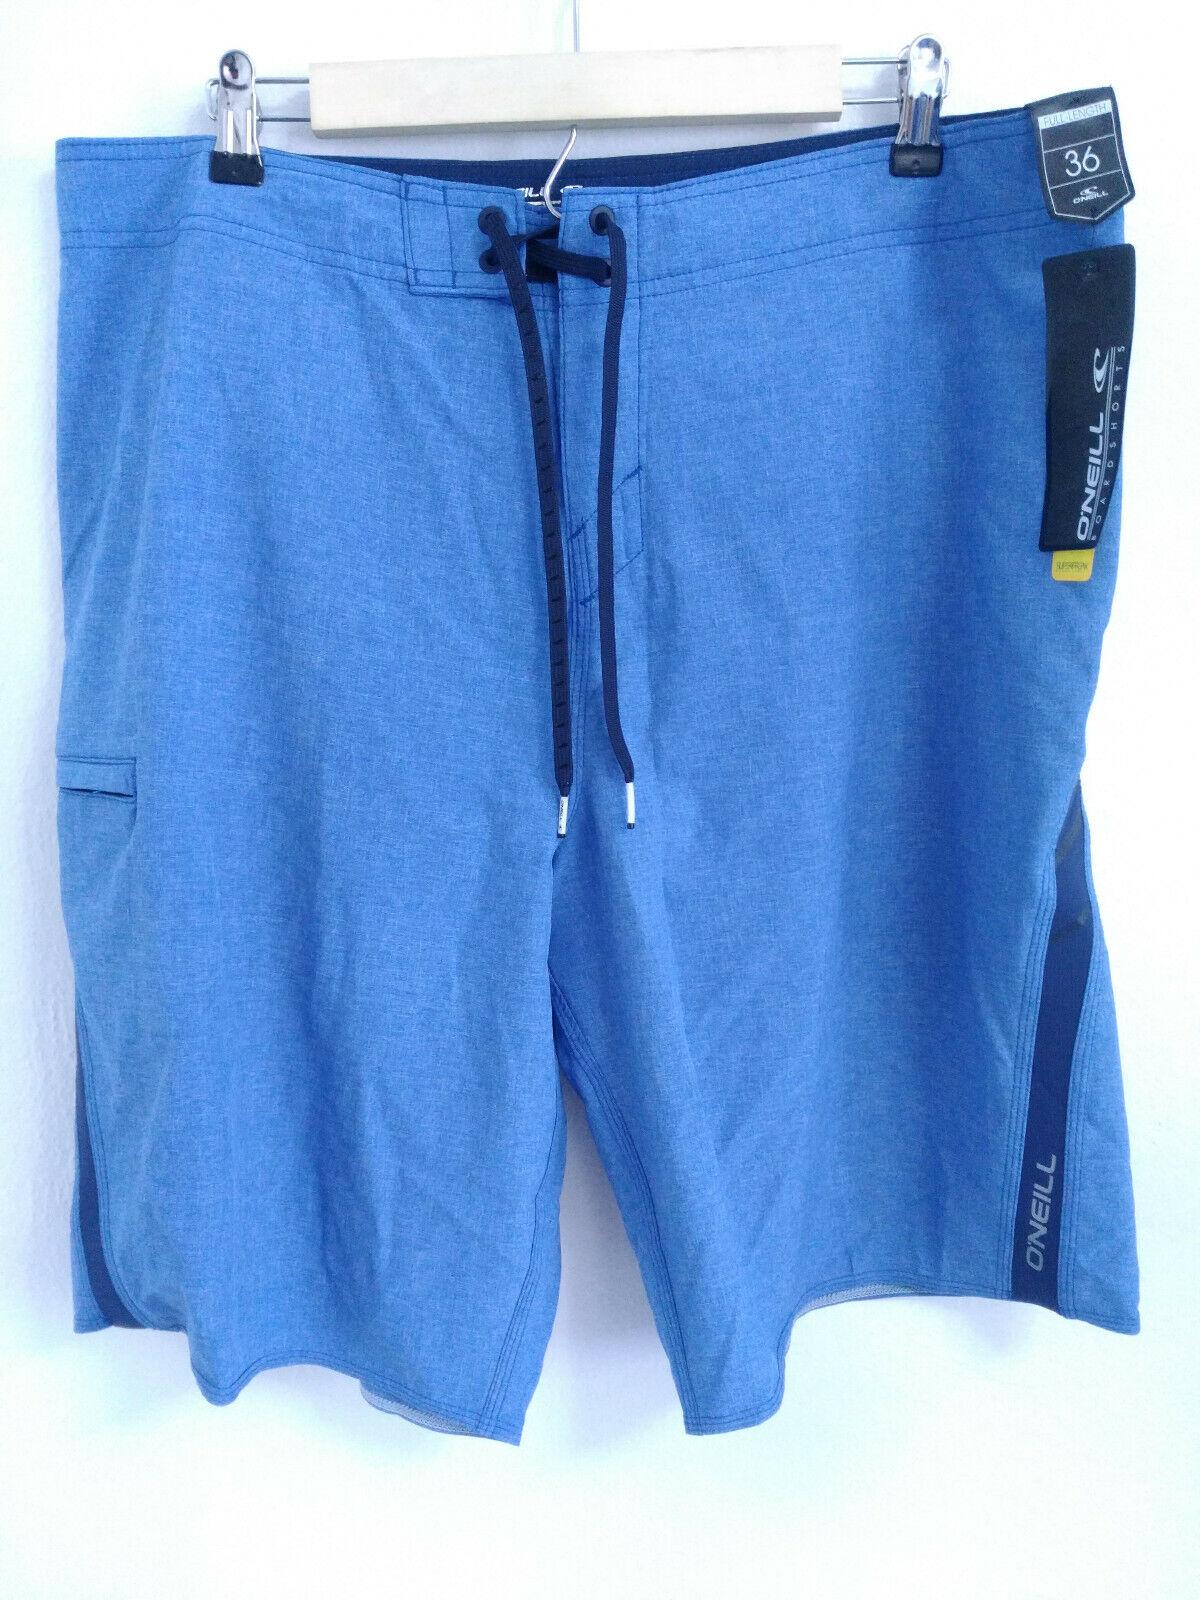 O'Neill Superfreak Boardshorts Mens Size 36 Blue Drawstring